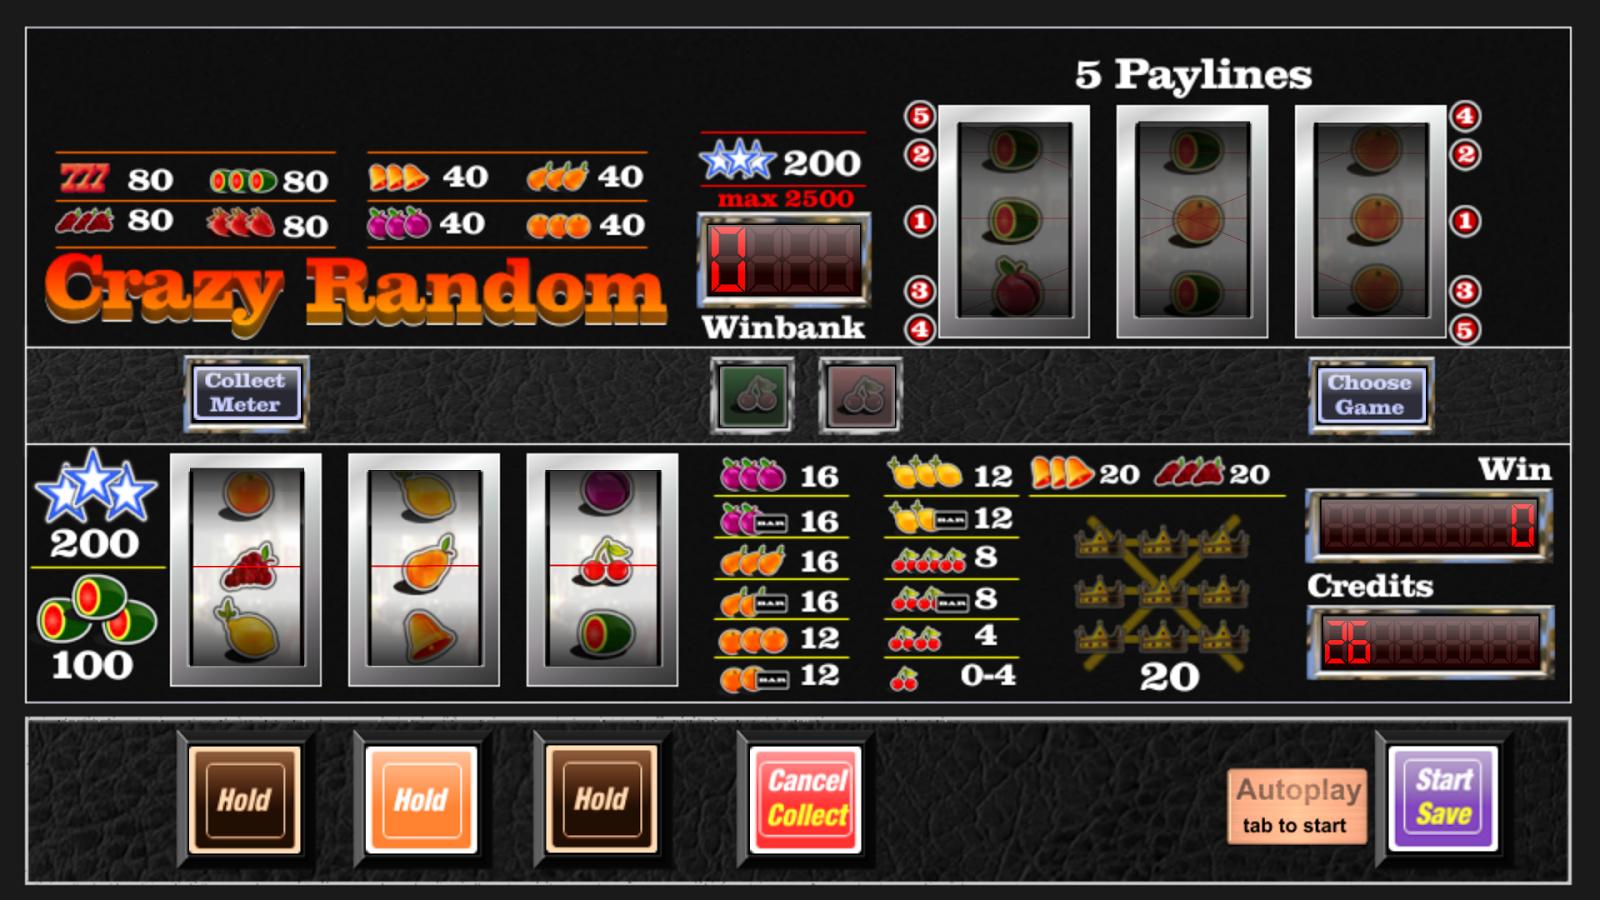 флеш игры азартные автоматы